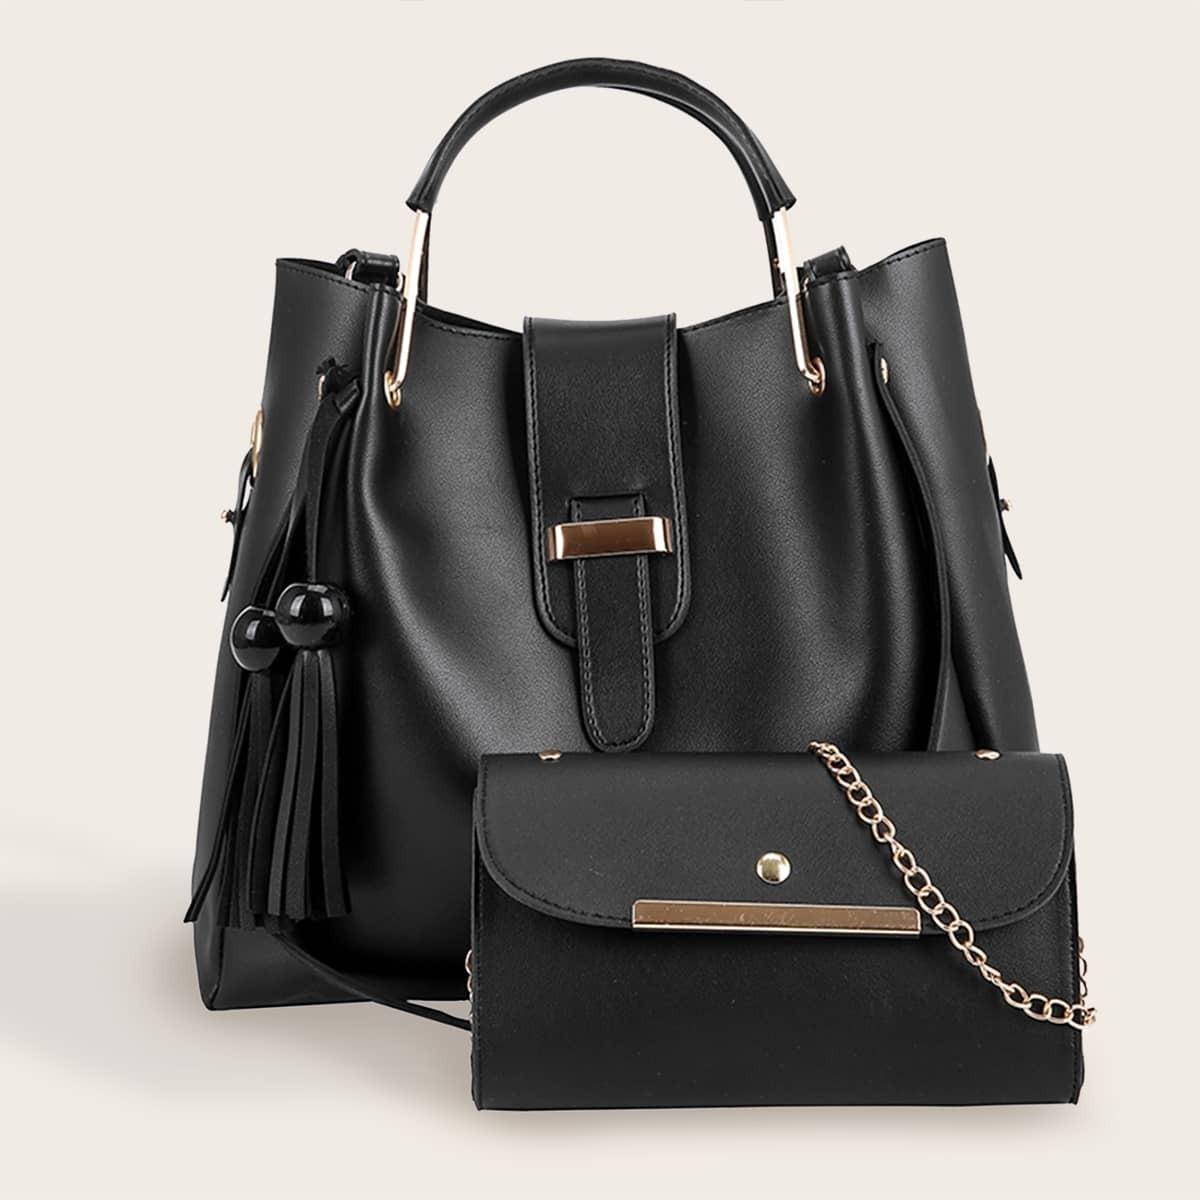 2pcs Tassel Decor Satchel Bag With Crossbody Bag